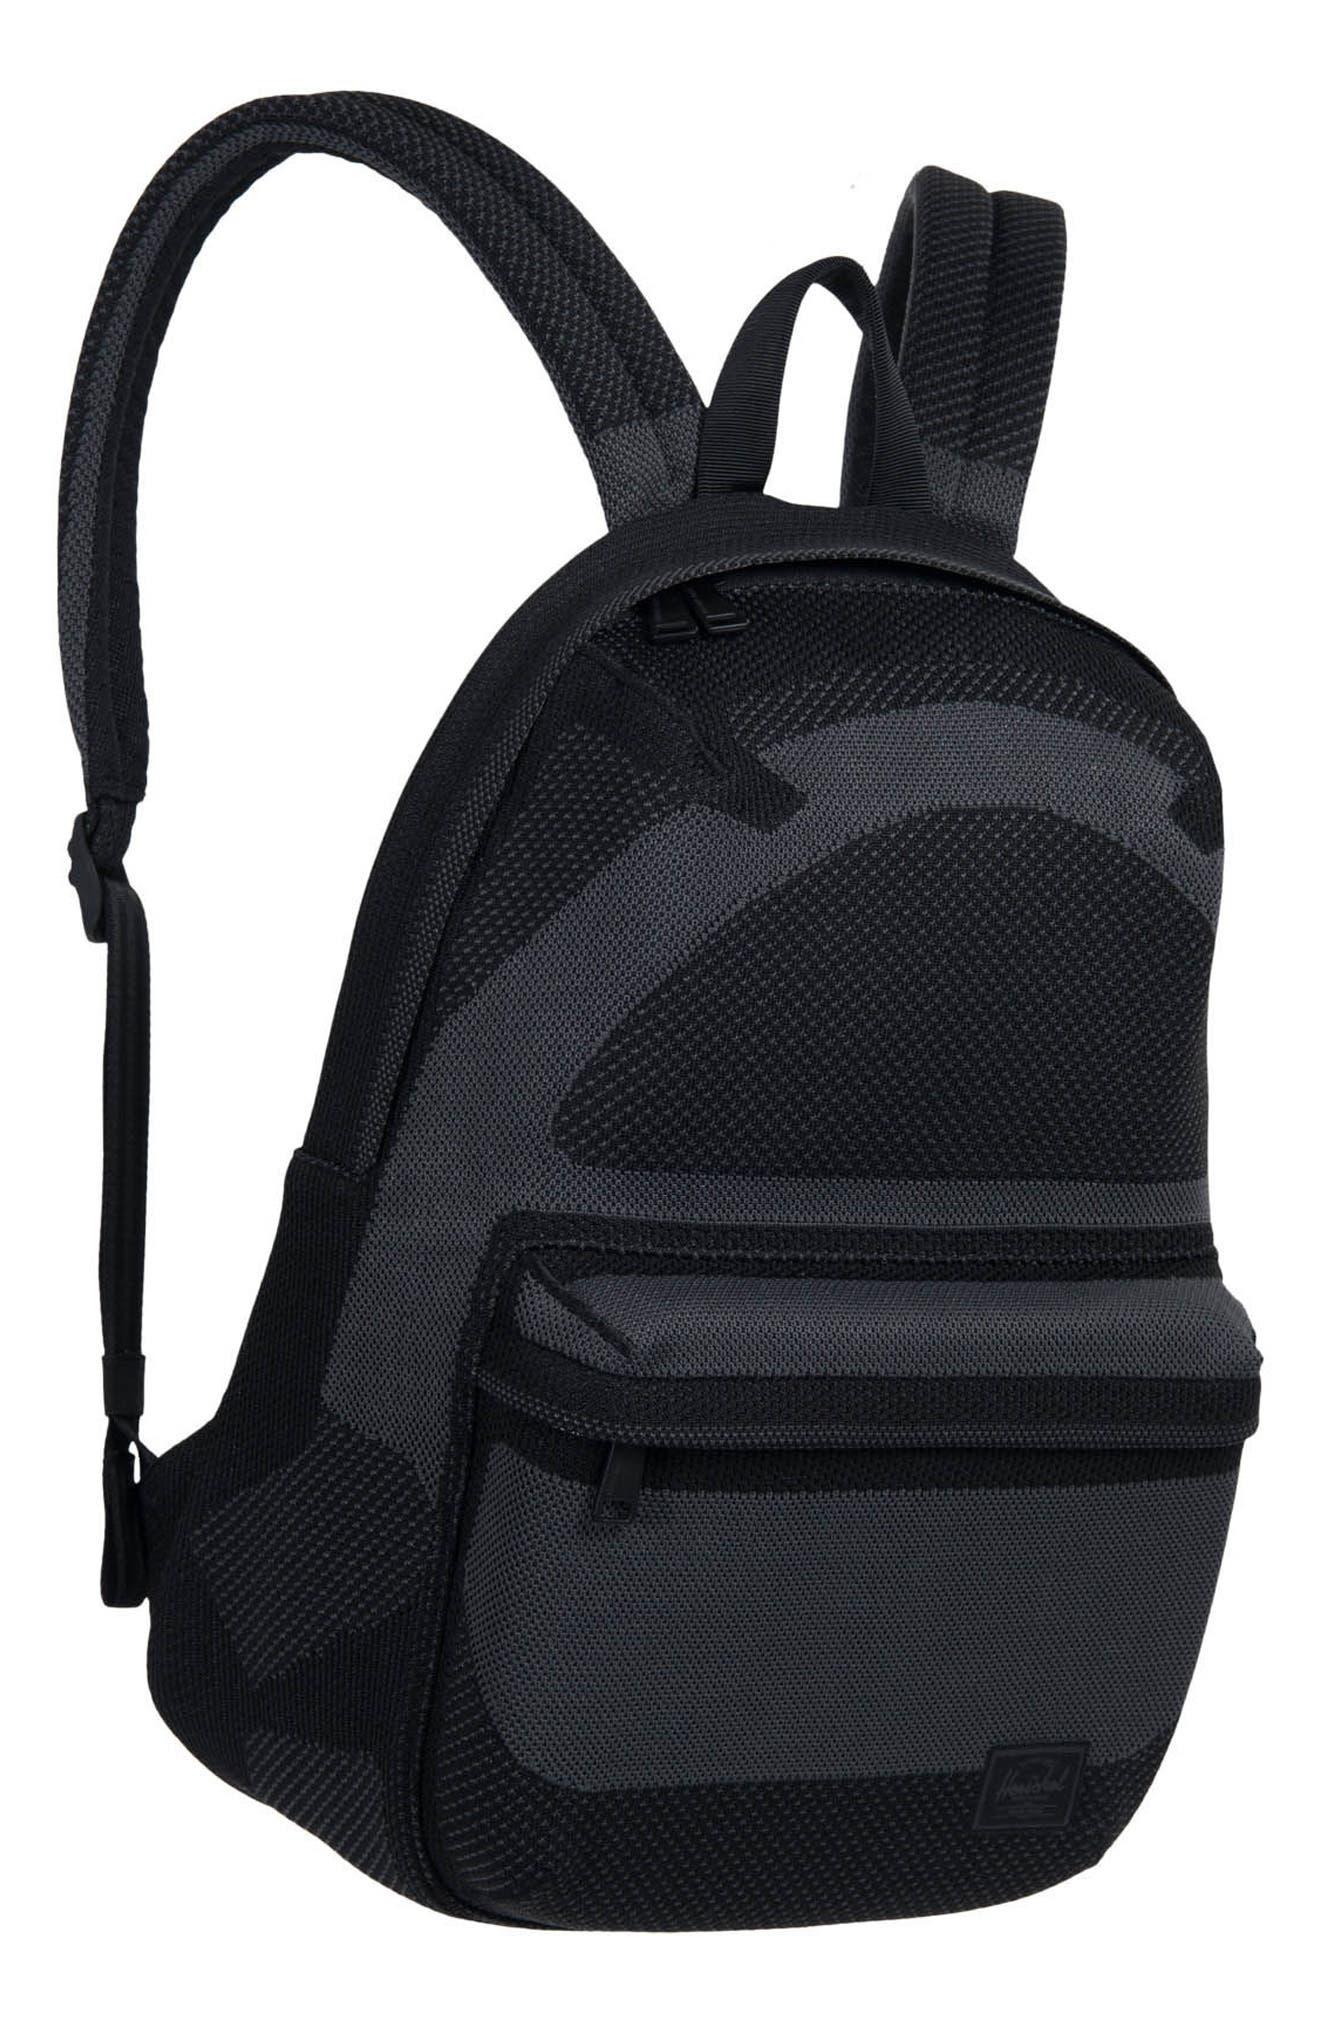 Apex Lawson Backpack,                             Main thumbnail 1, color,                             030